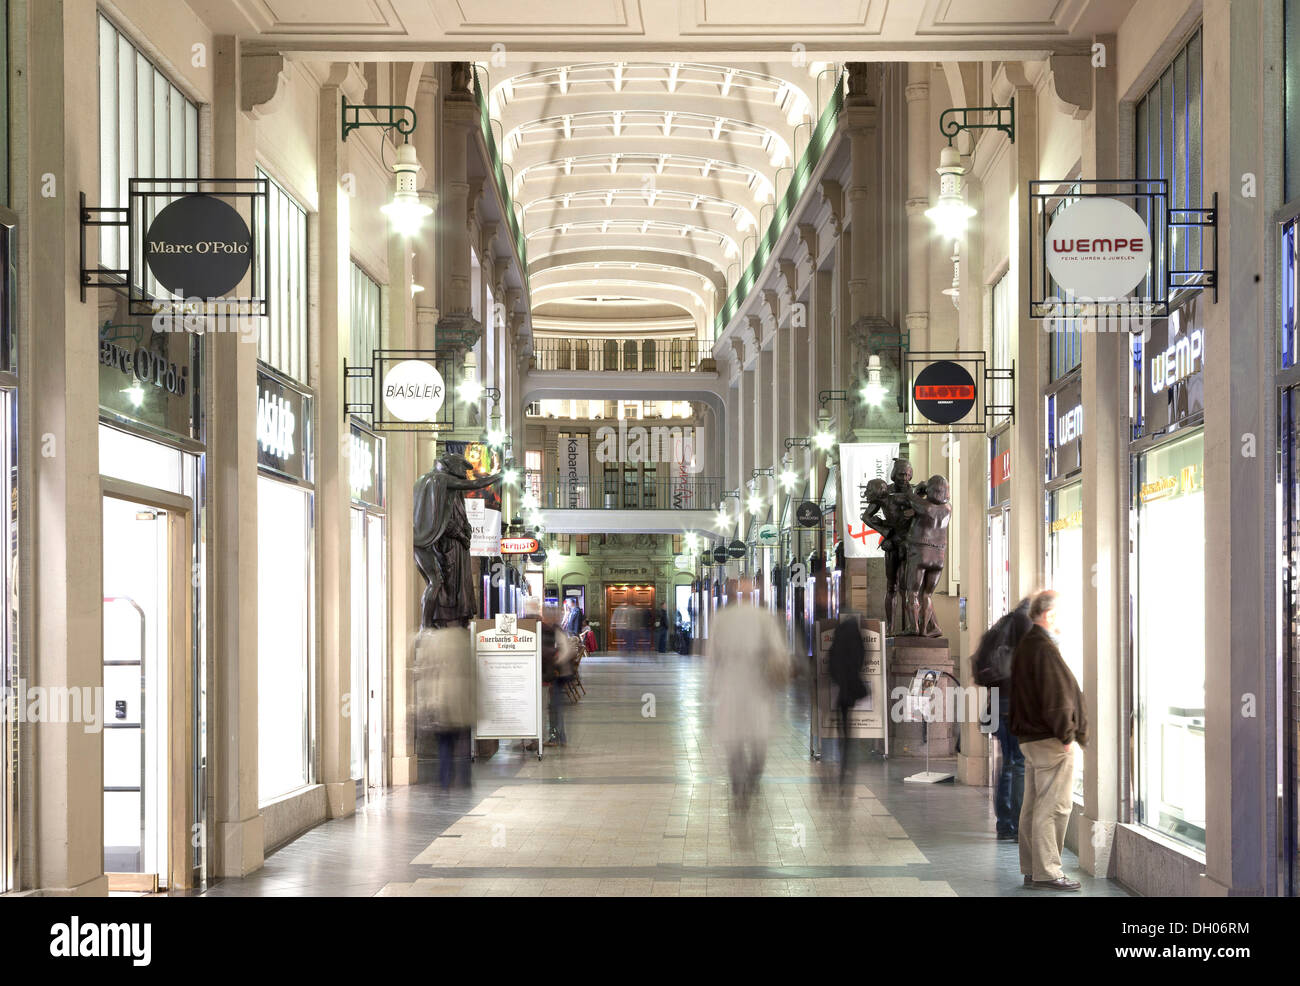 Maedlerpassage shopping arcade, entrance to Auerbach's Keller, Leipzig, Saxony, PublicGround - Stock Image